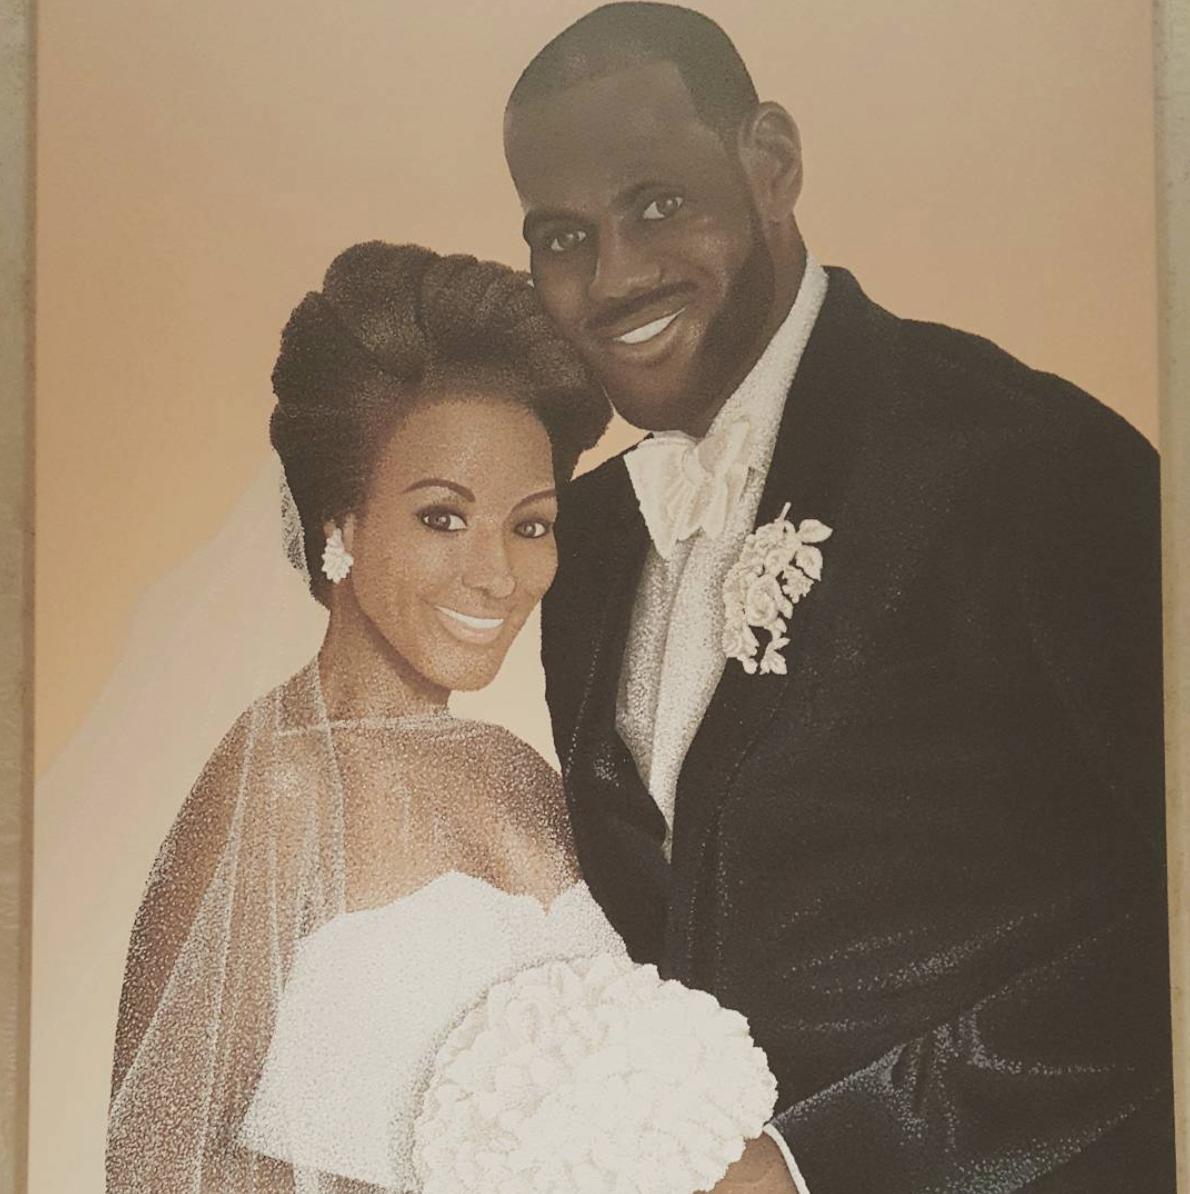 23 Times Lebron James And His Wife Savannah Were The Perfect Pair In 2020 Lebron James King Lebron James Savannah Chat